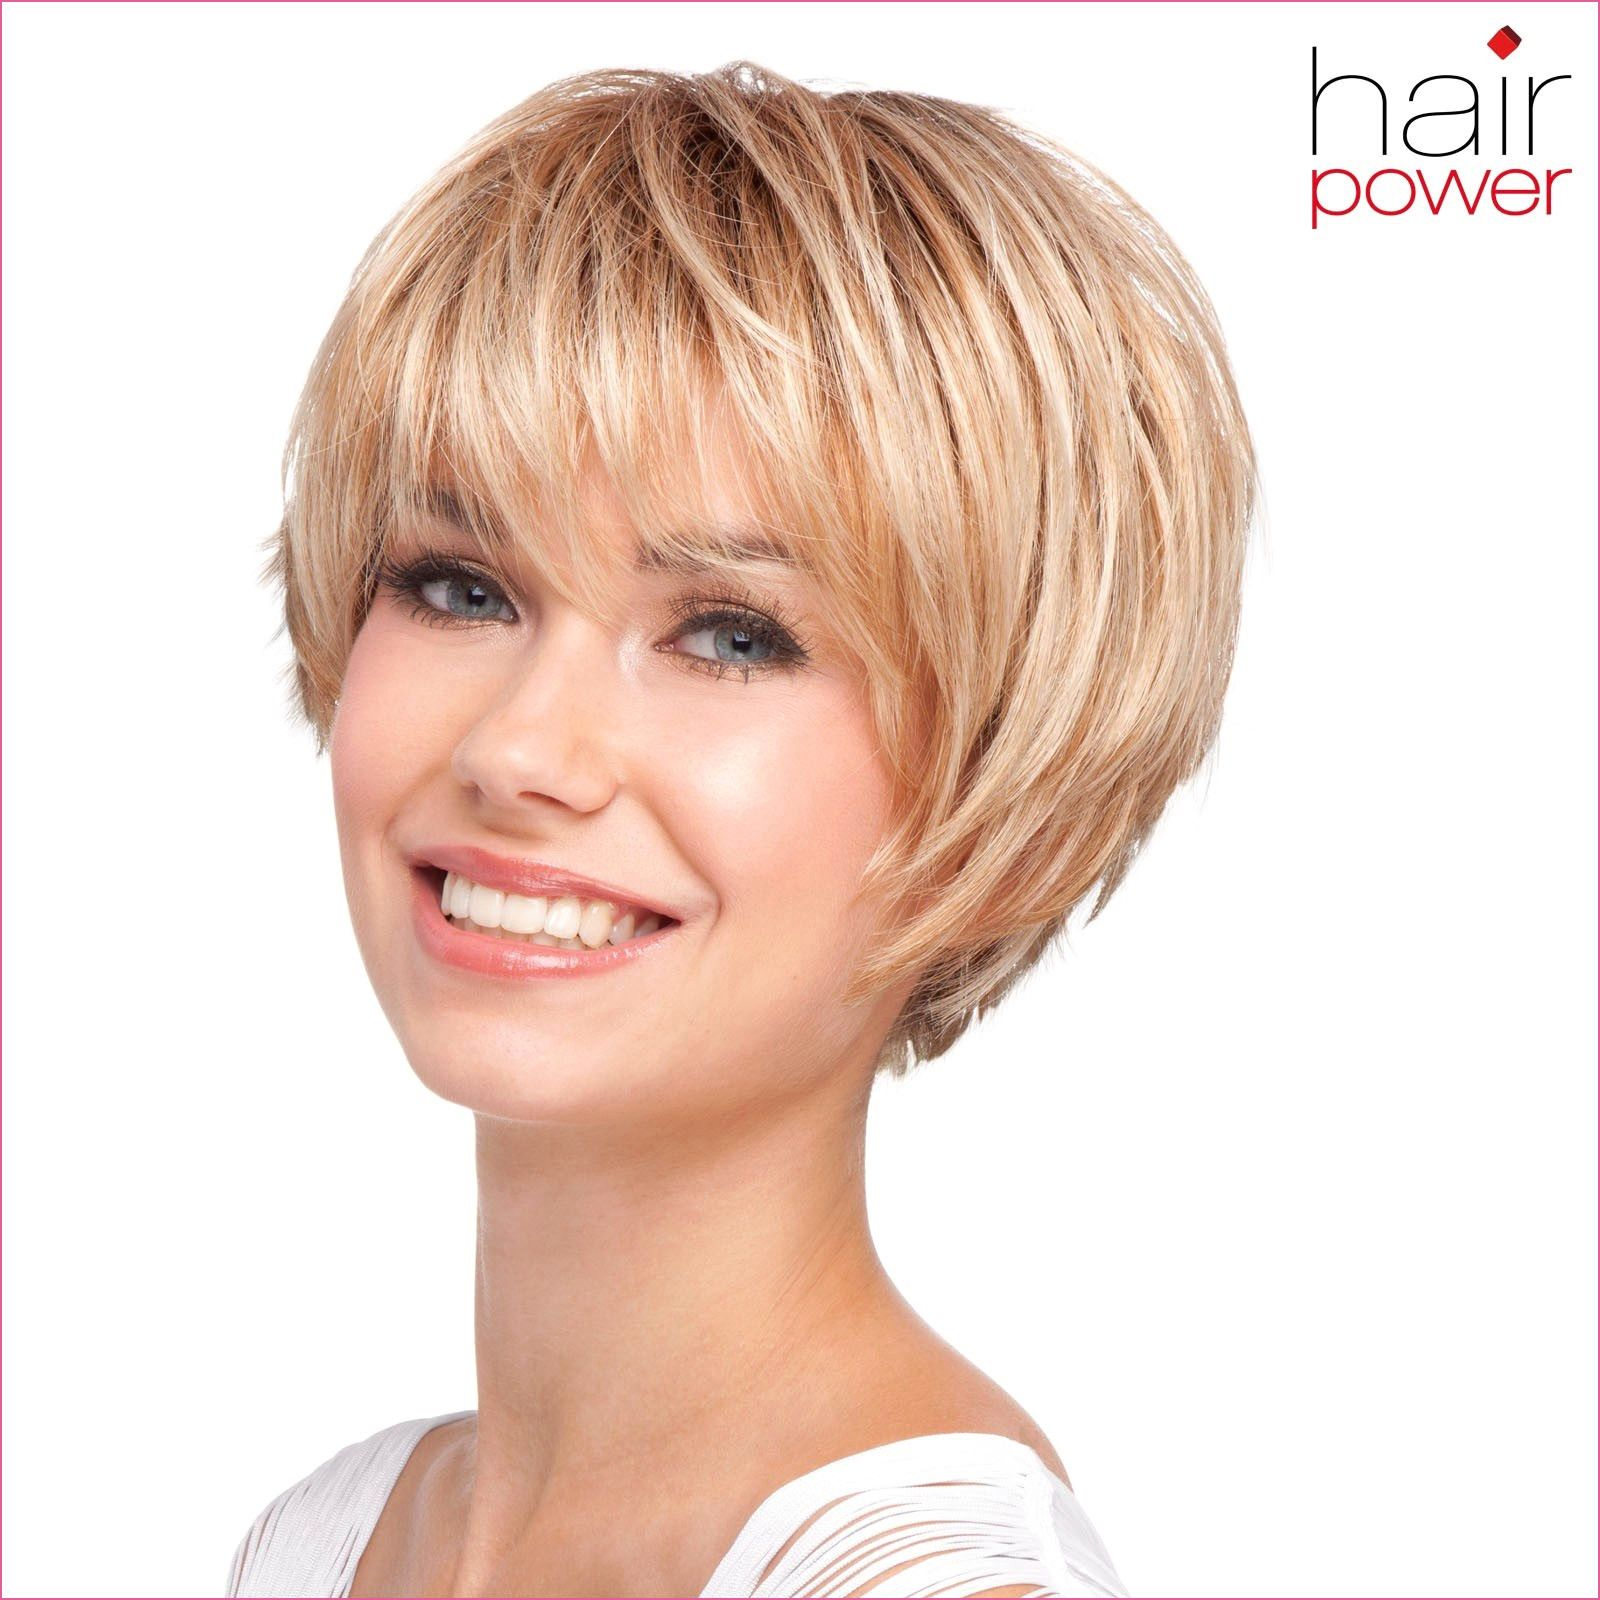 Fein Aktuelle Frisuren 2020 Kapsels Voor Kort Haar Kapsels Kort Haar Kapsels